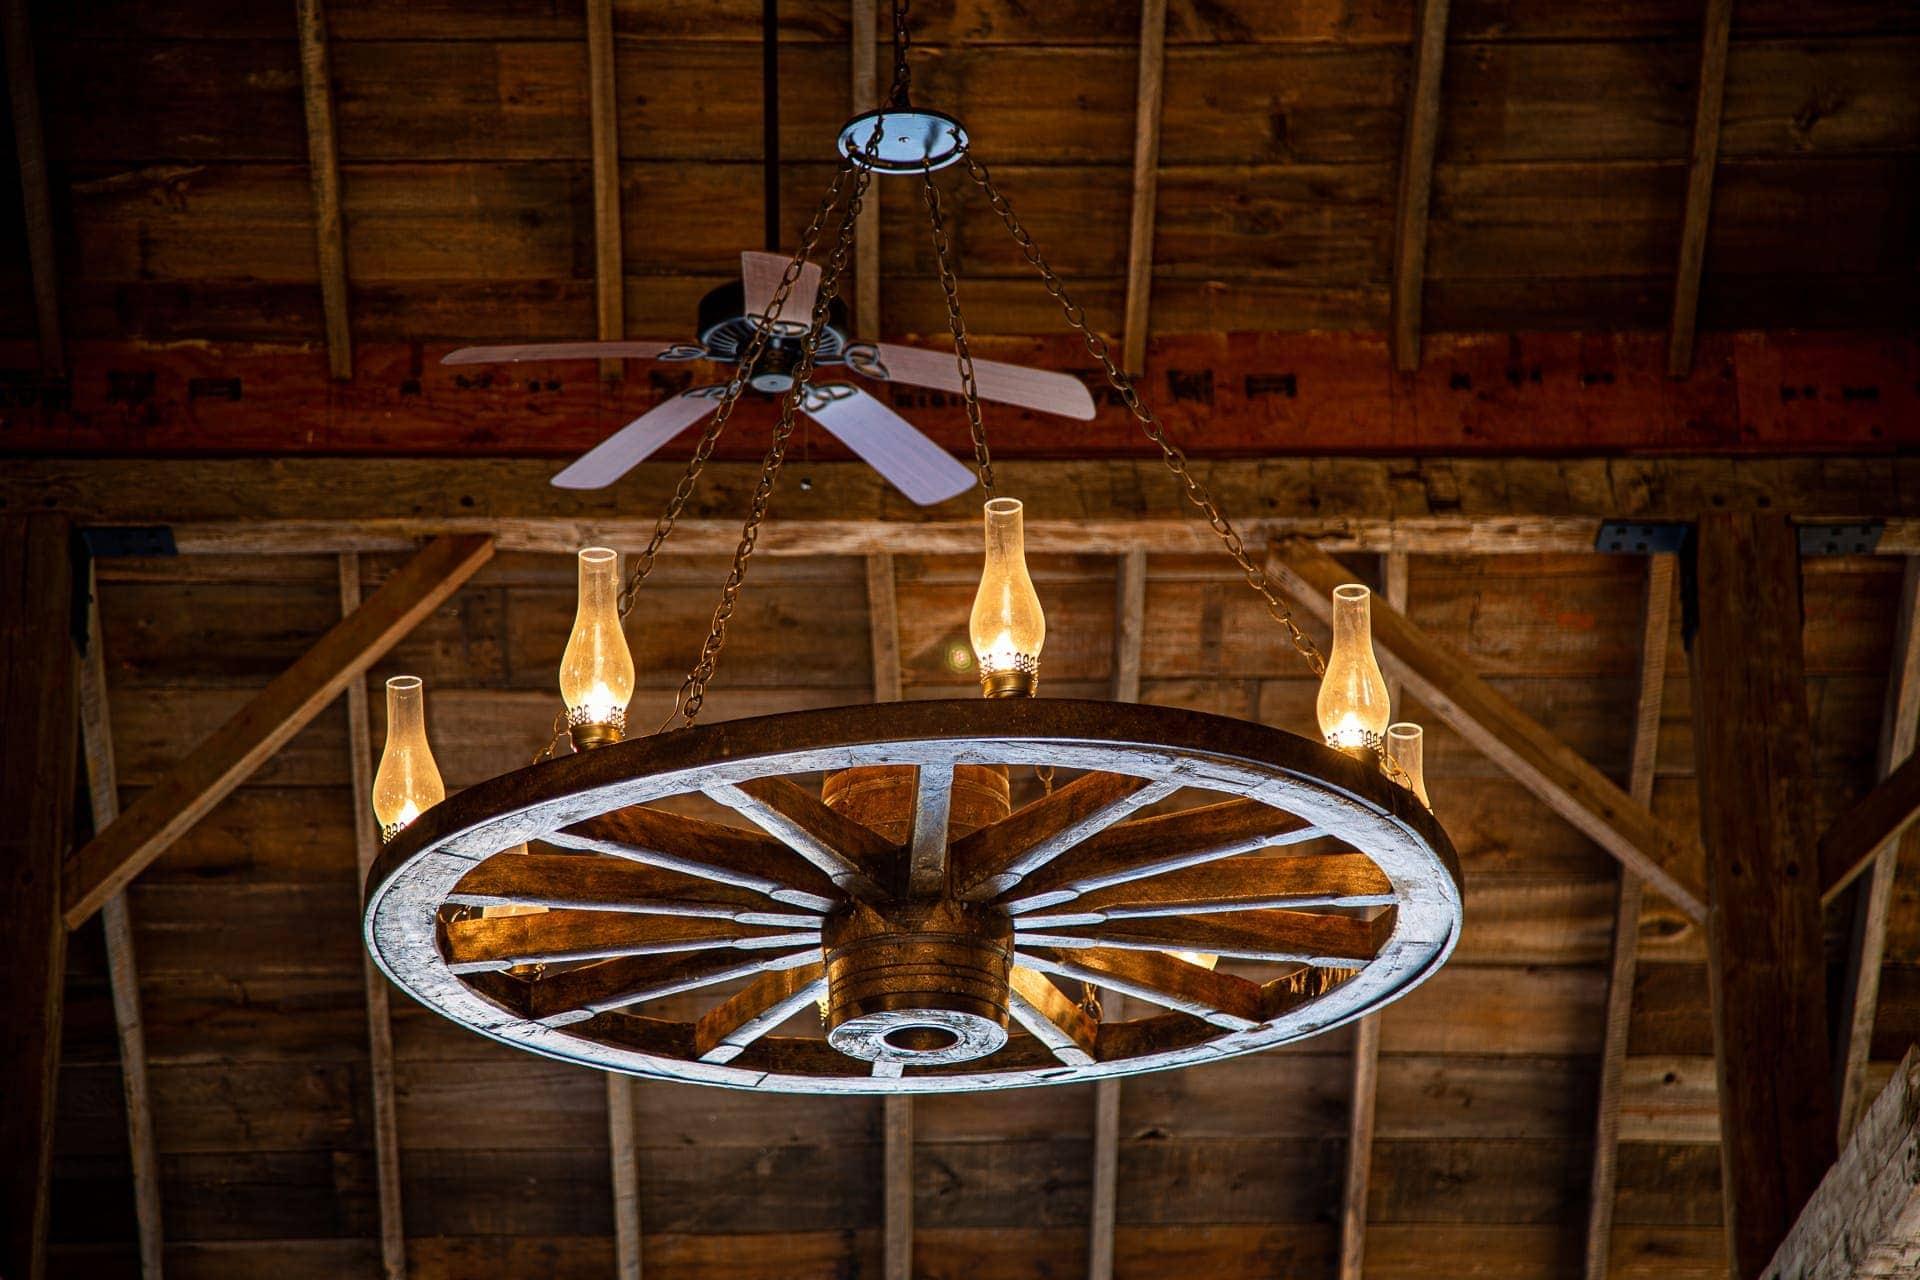 Vintage Chandelier in the Barn at Esperanza Ranch